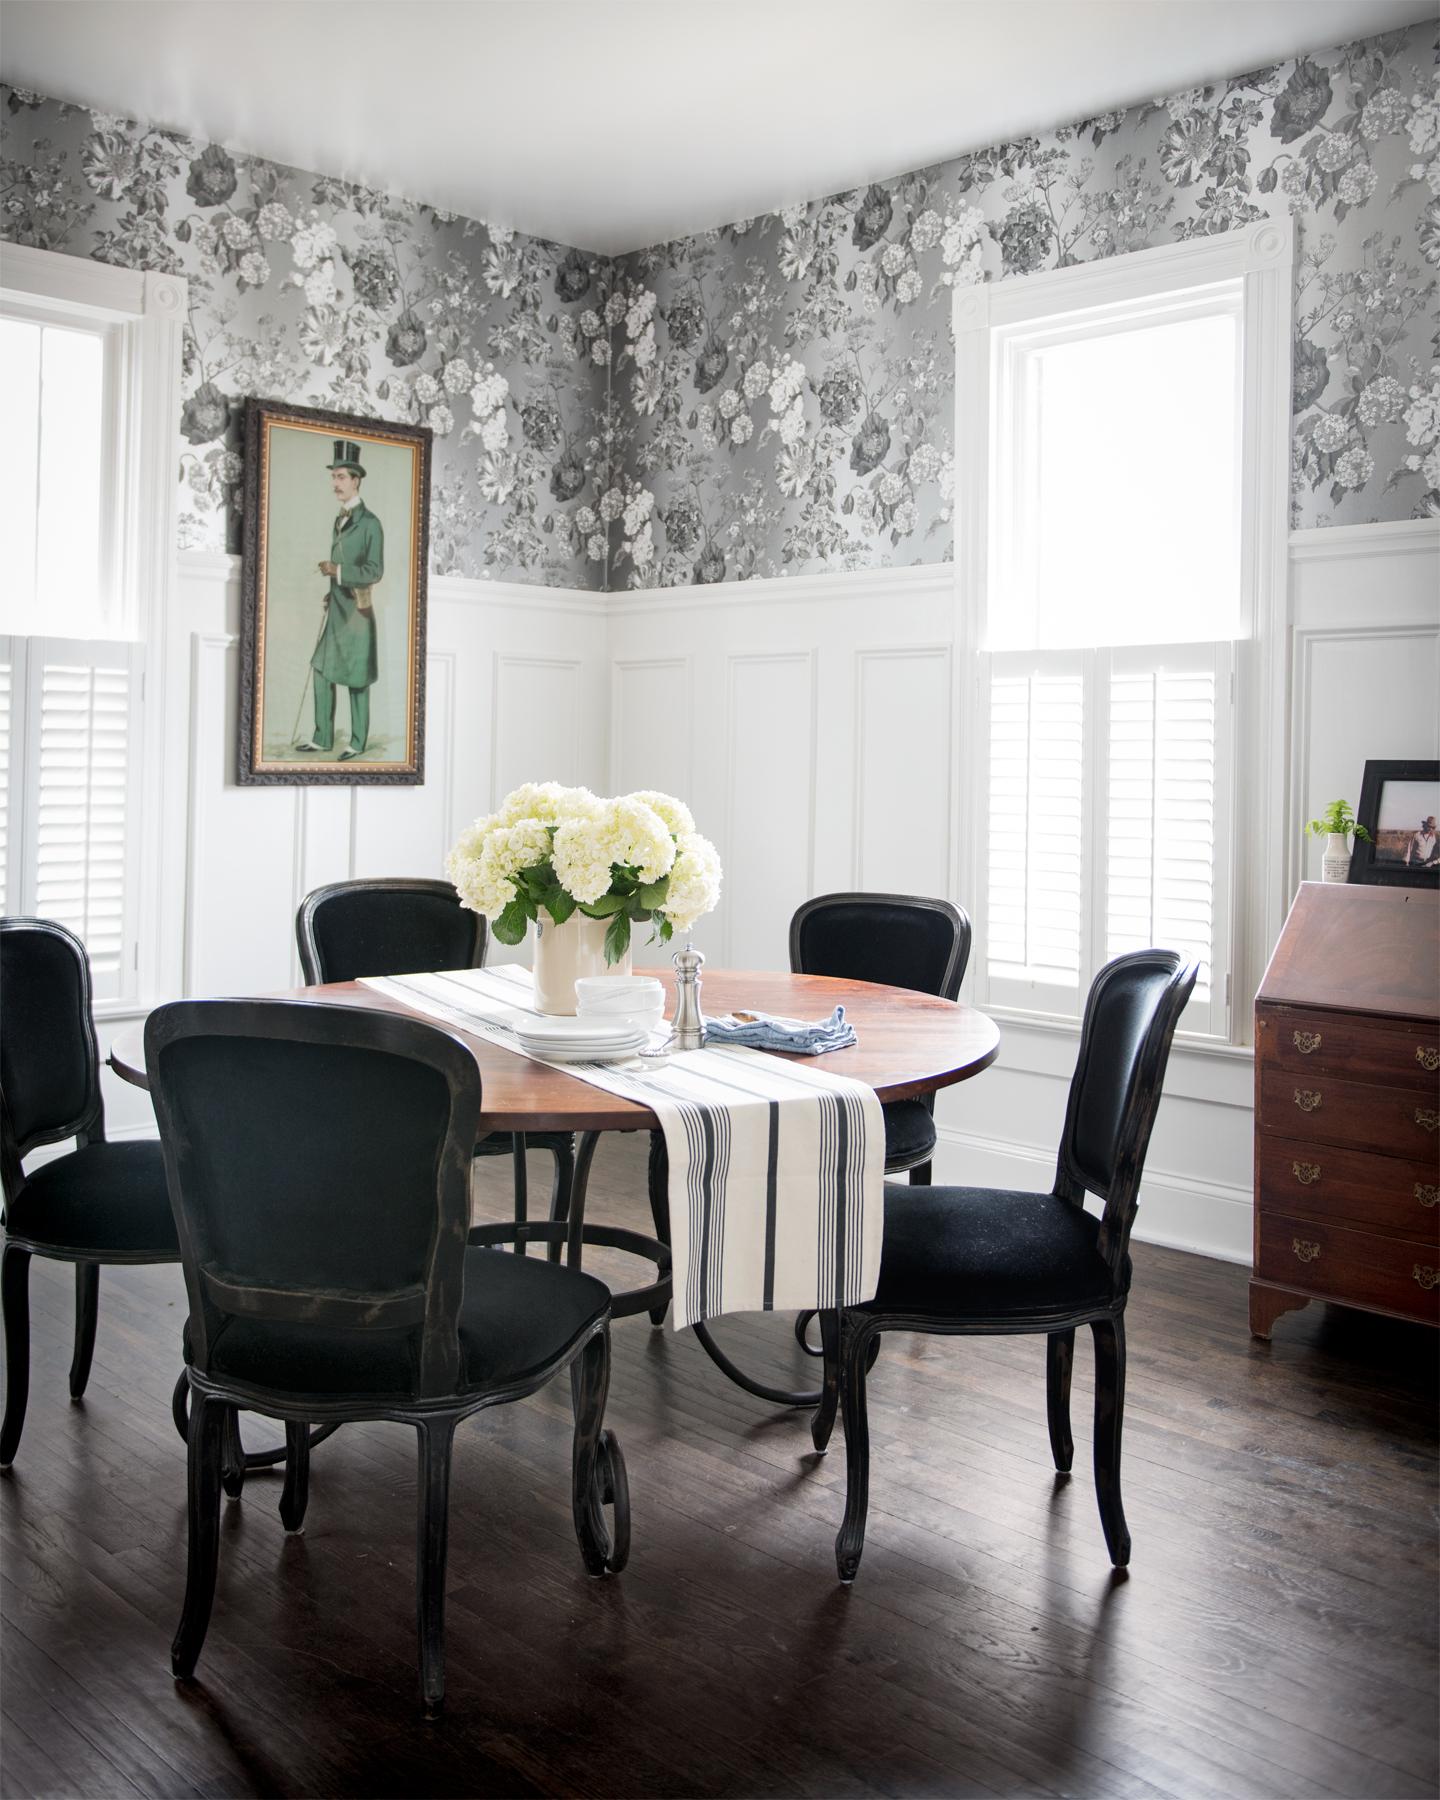 35 Dining Room Decorating Ideas Inspiration: Holly Williams Nashville Home